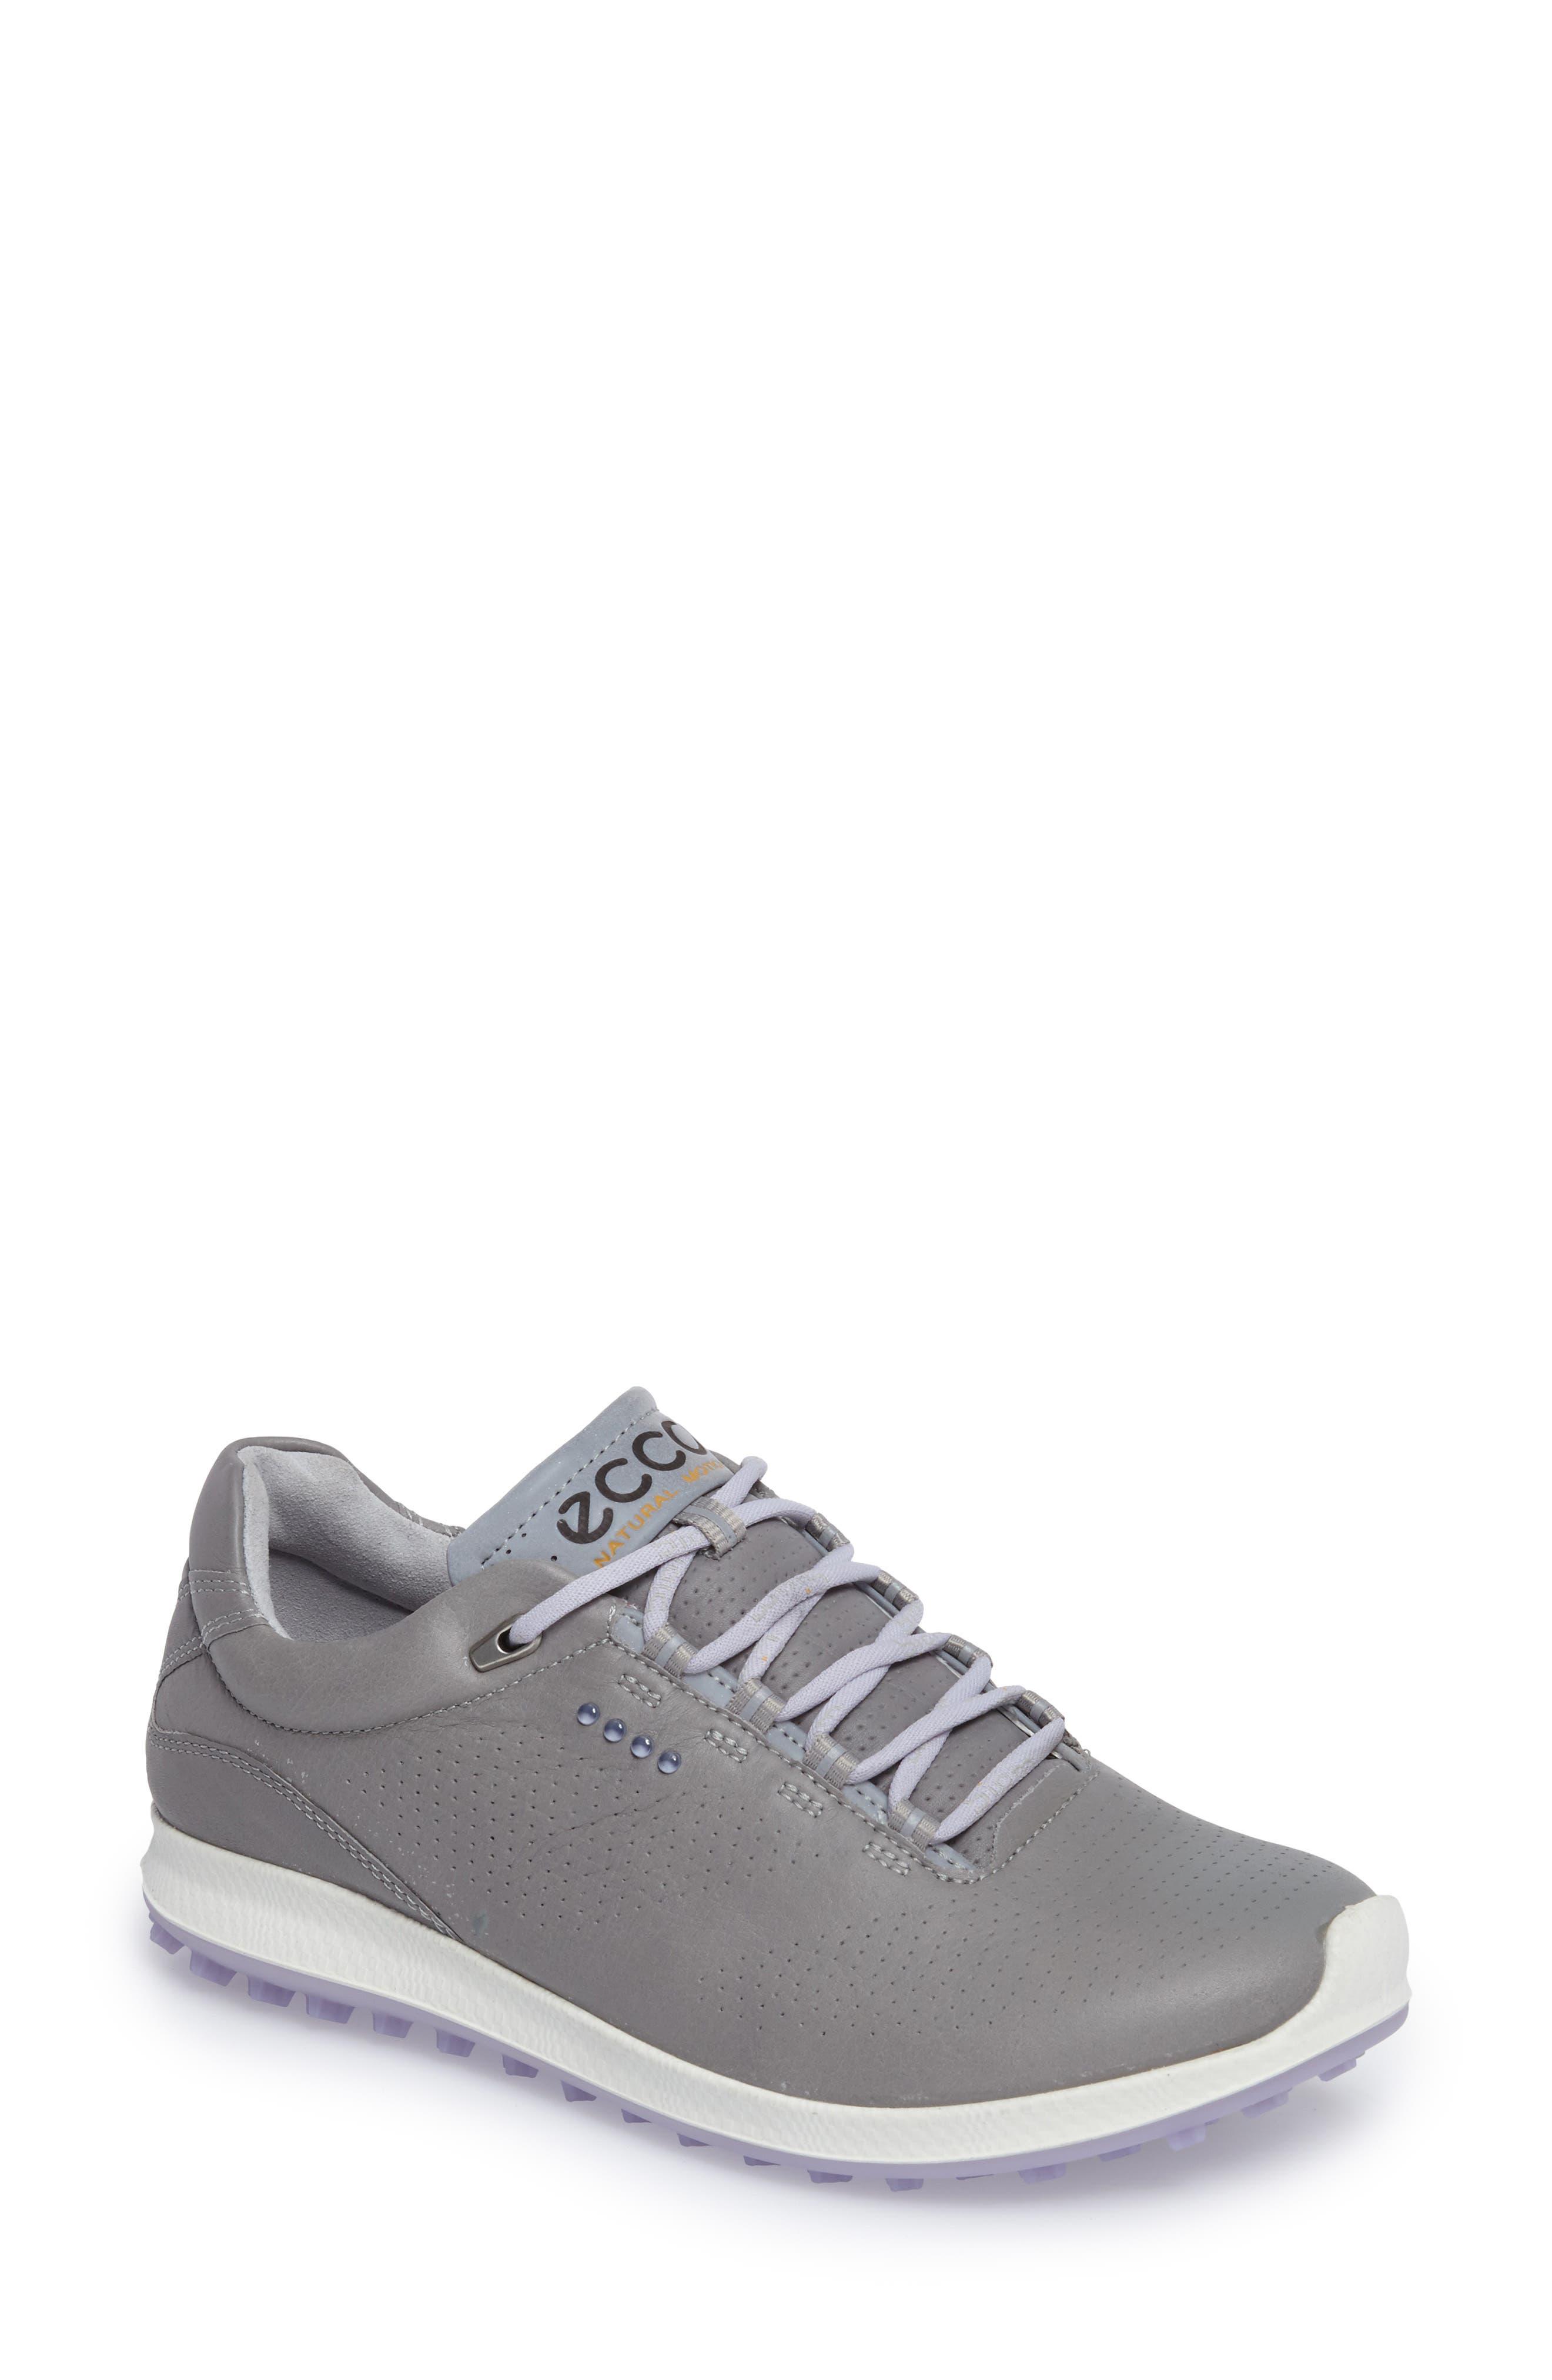 BIOM 2 Hybrid Water-Repellent Golf Shoe,                         Main,                         color, 020